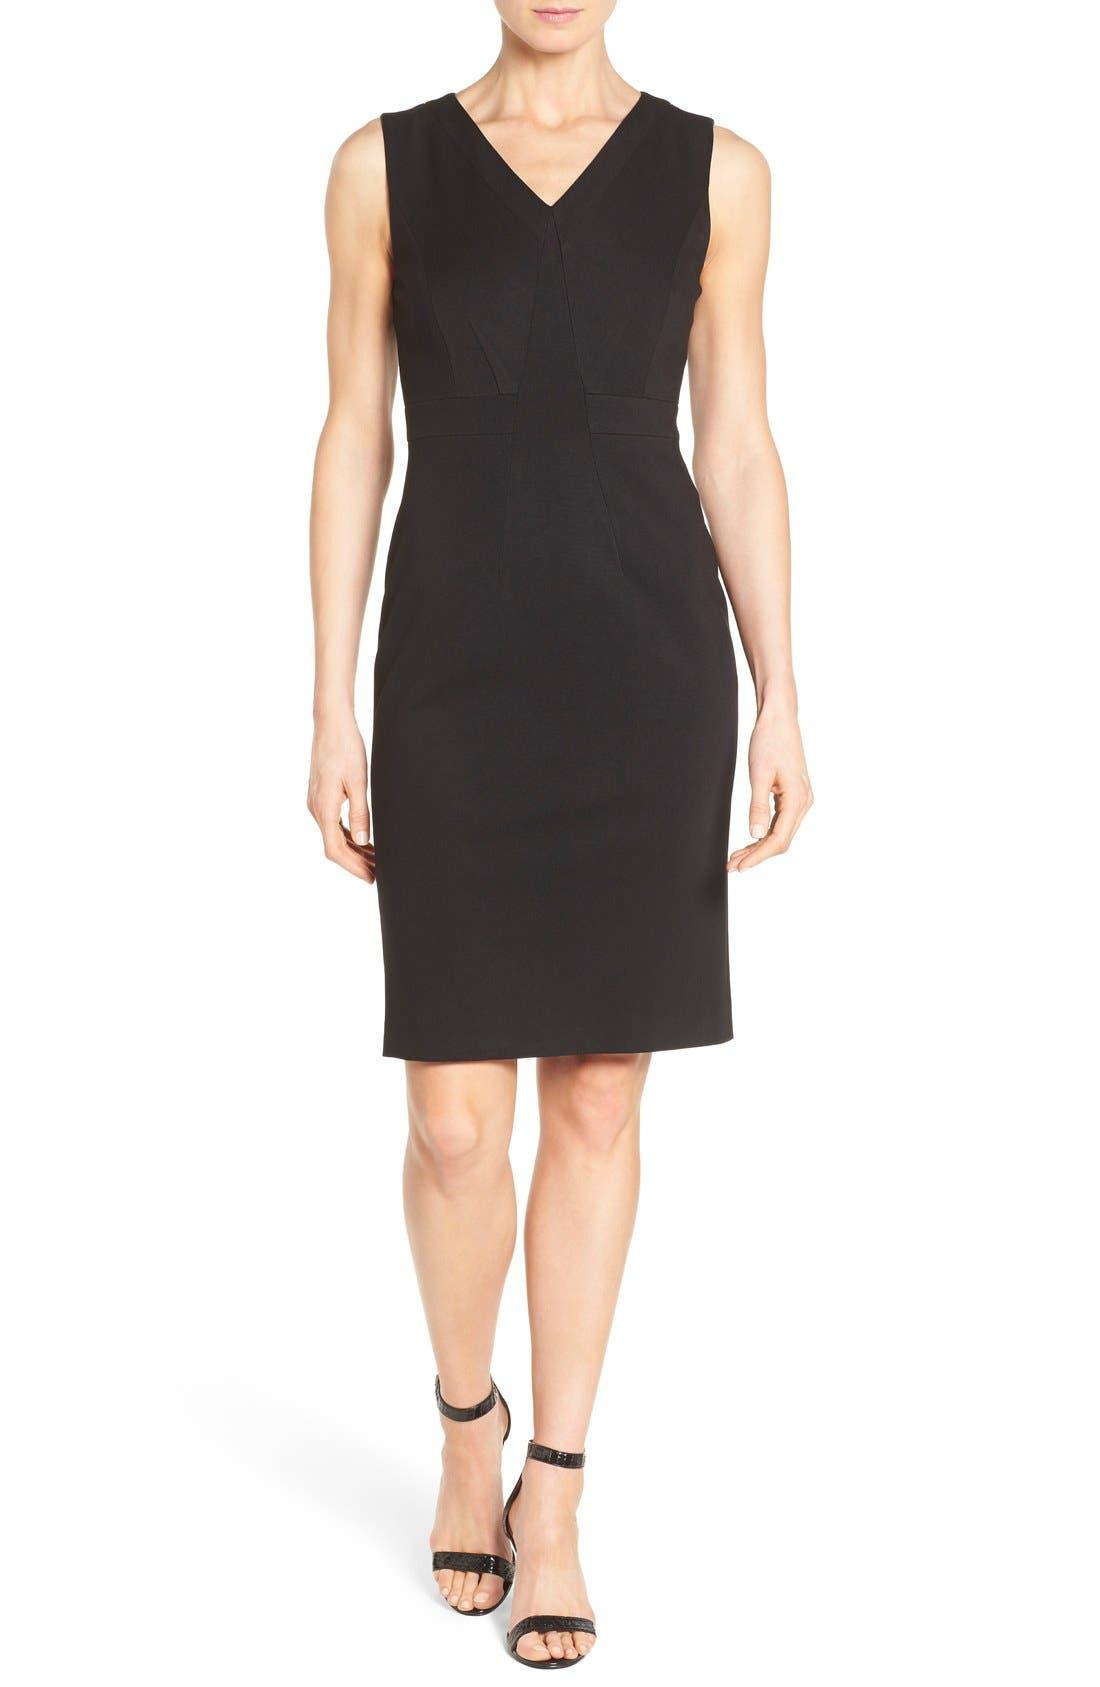 Alternate Image 1 Selected - Classiques Entier® Sleeveless Italian Ponte V-Neck Sheath Dress (Regular & Petite)